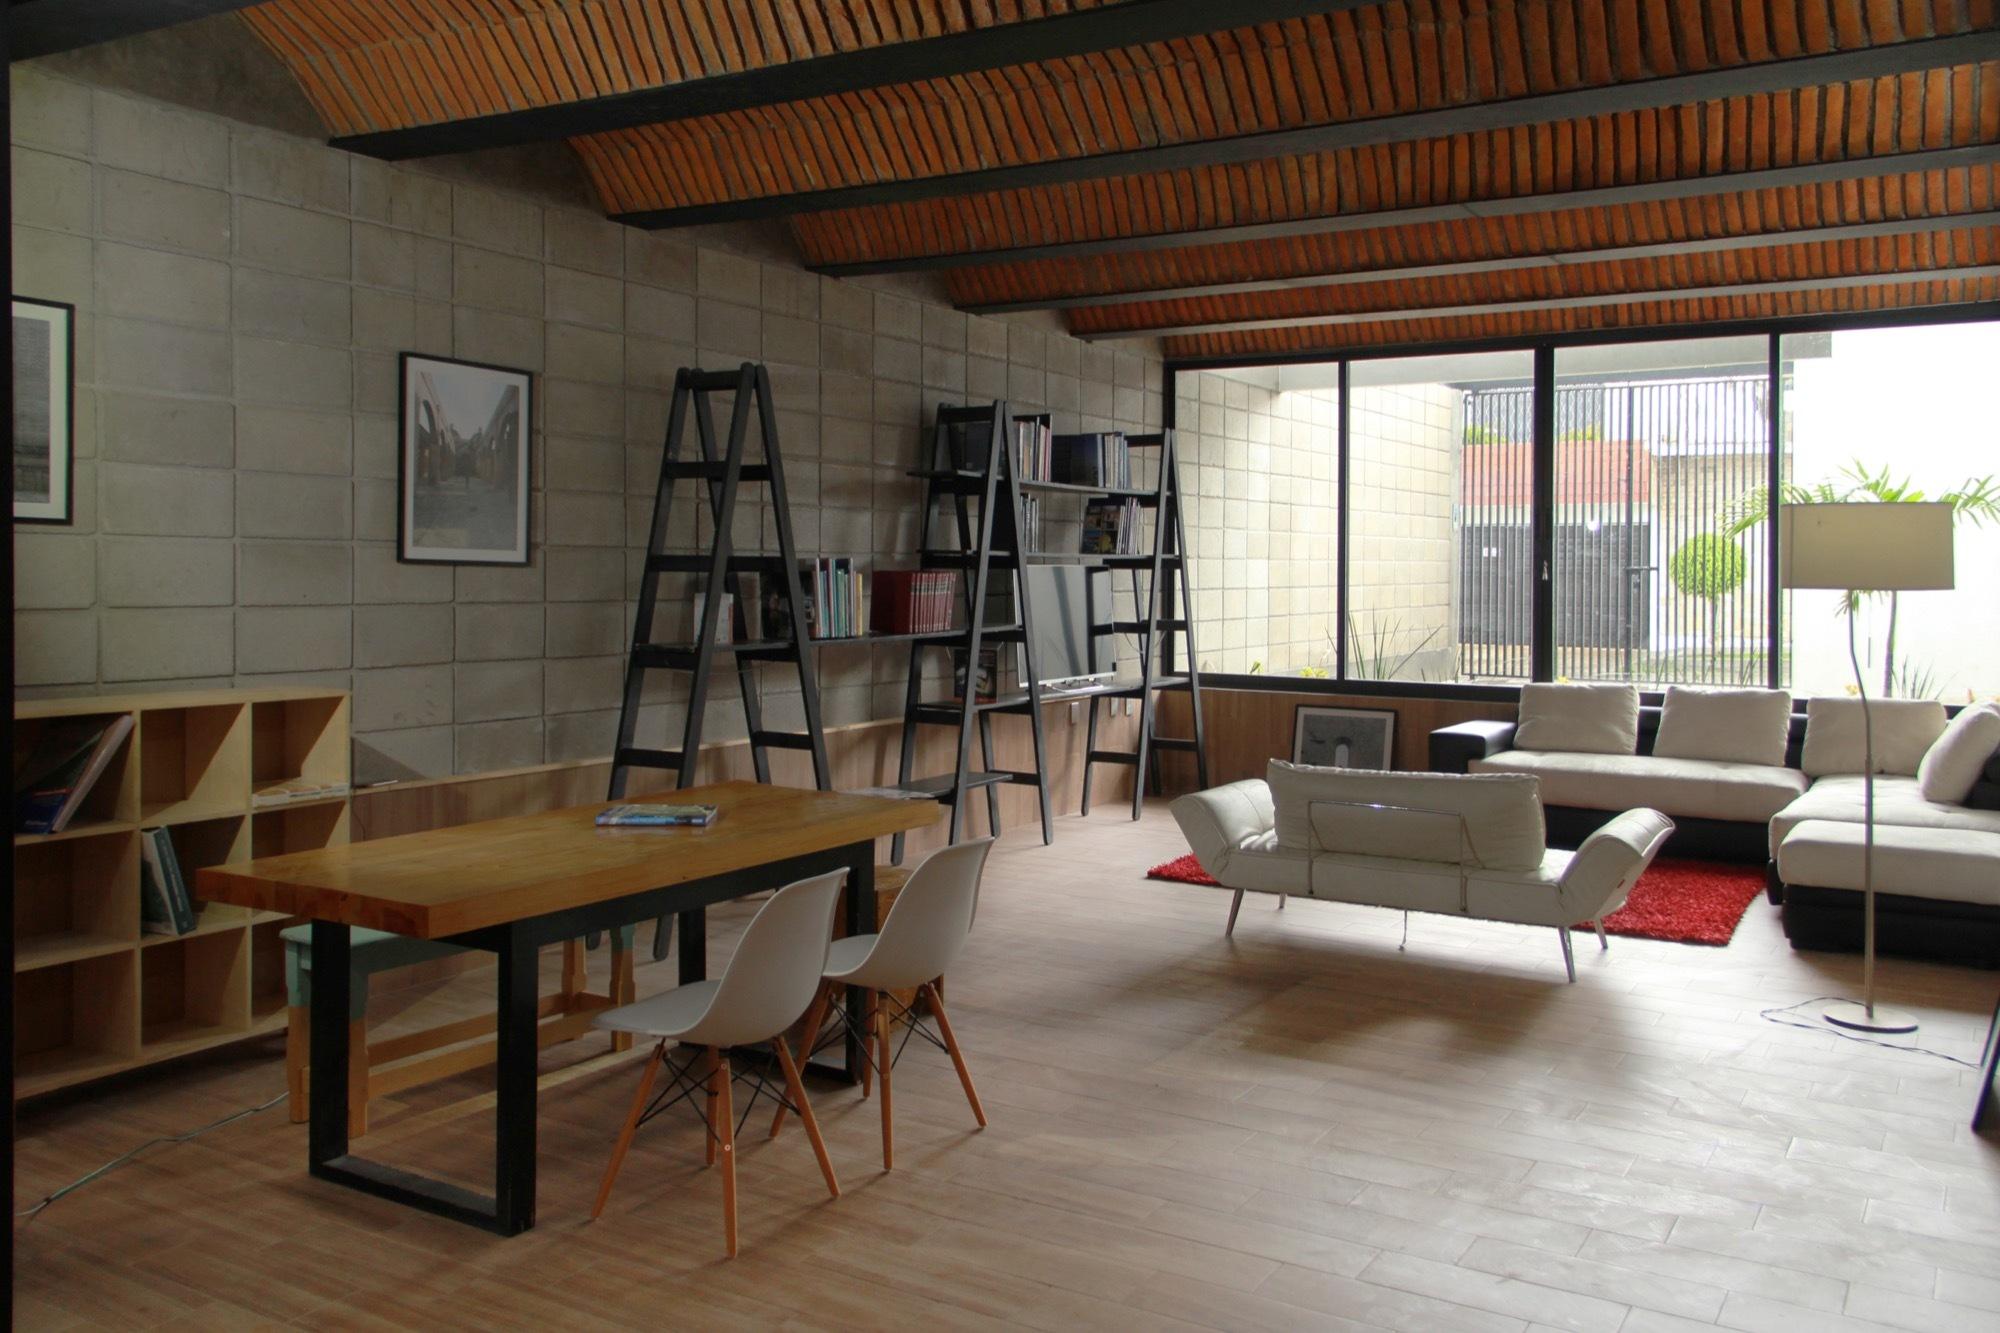 Galer a de casa jard n apaloosa estudio de arquitectura for Estudio de arquitectura